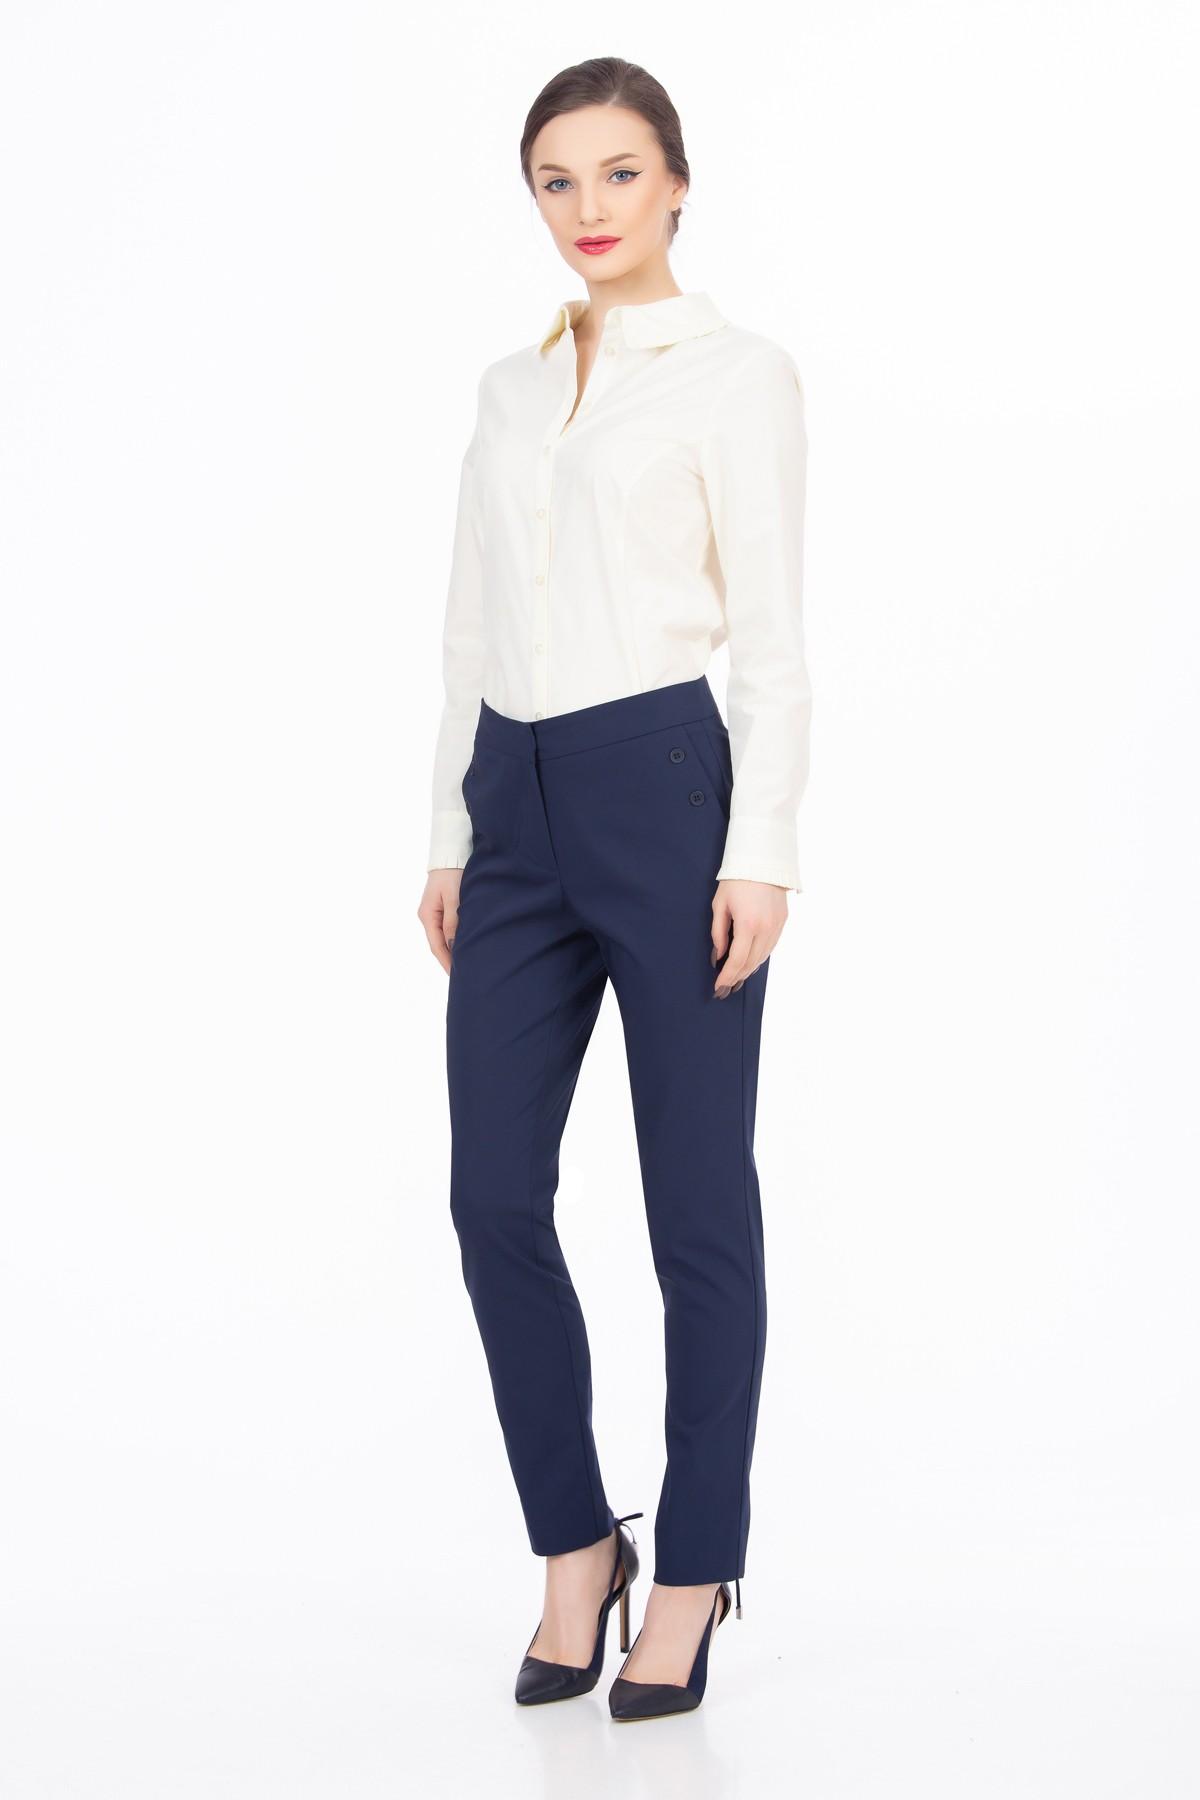 pantaloni-bleumarin-office-sense